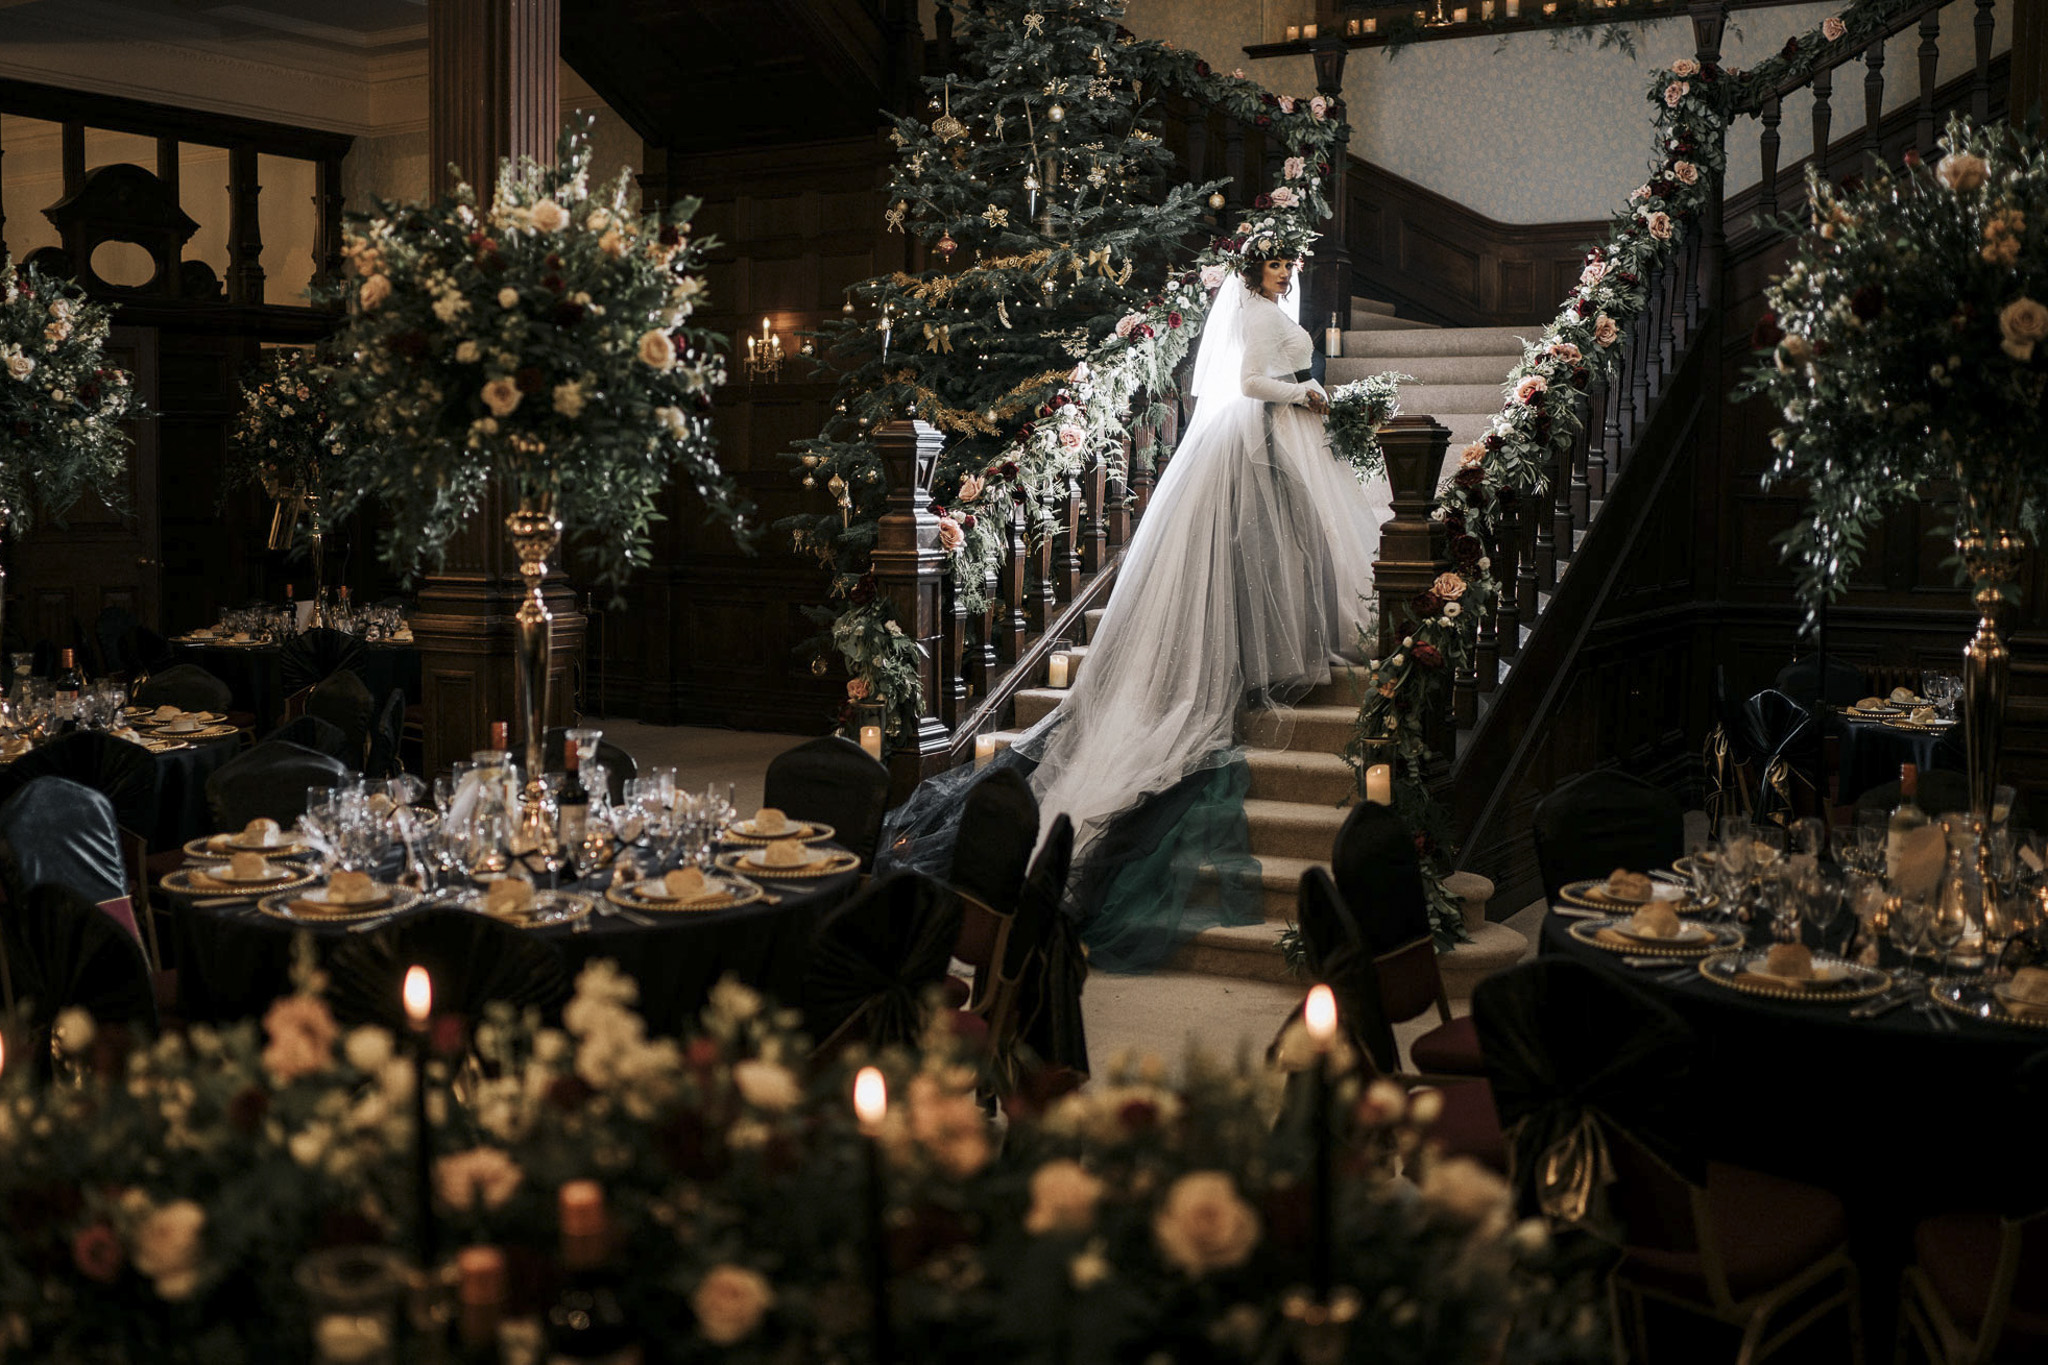 Wedding photographers South Wales| LLechwen Hall